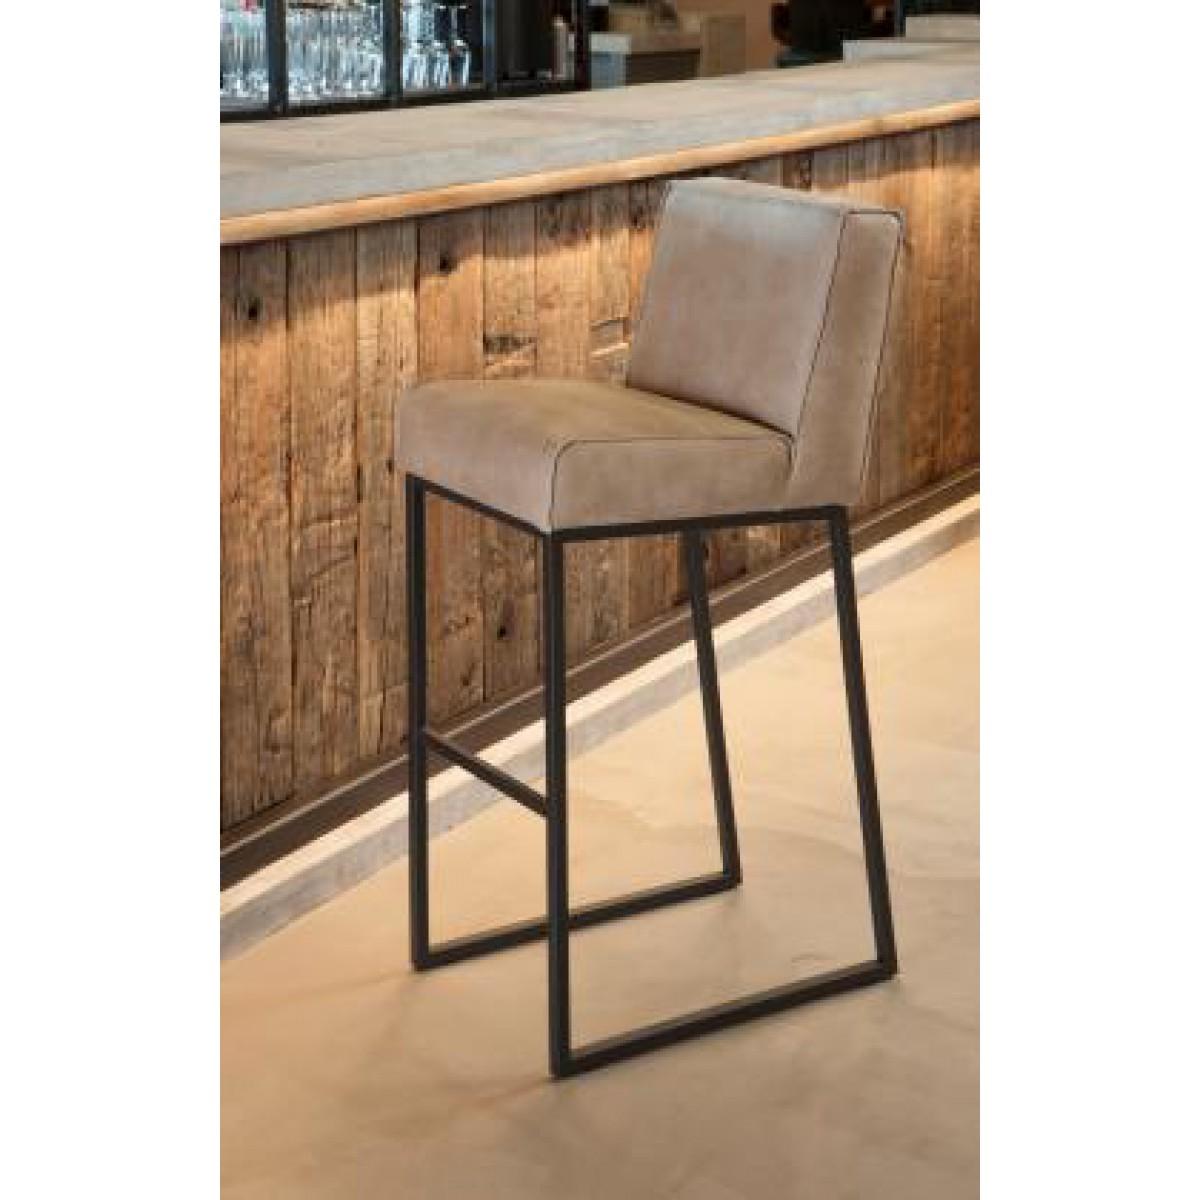 barkruk-barhocker-stool-het-anker-lara-miltonhouse-sfeer